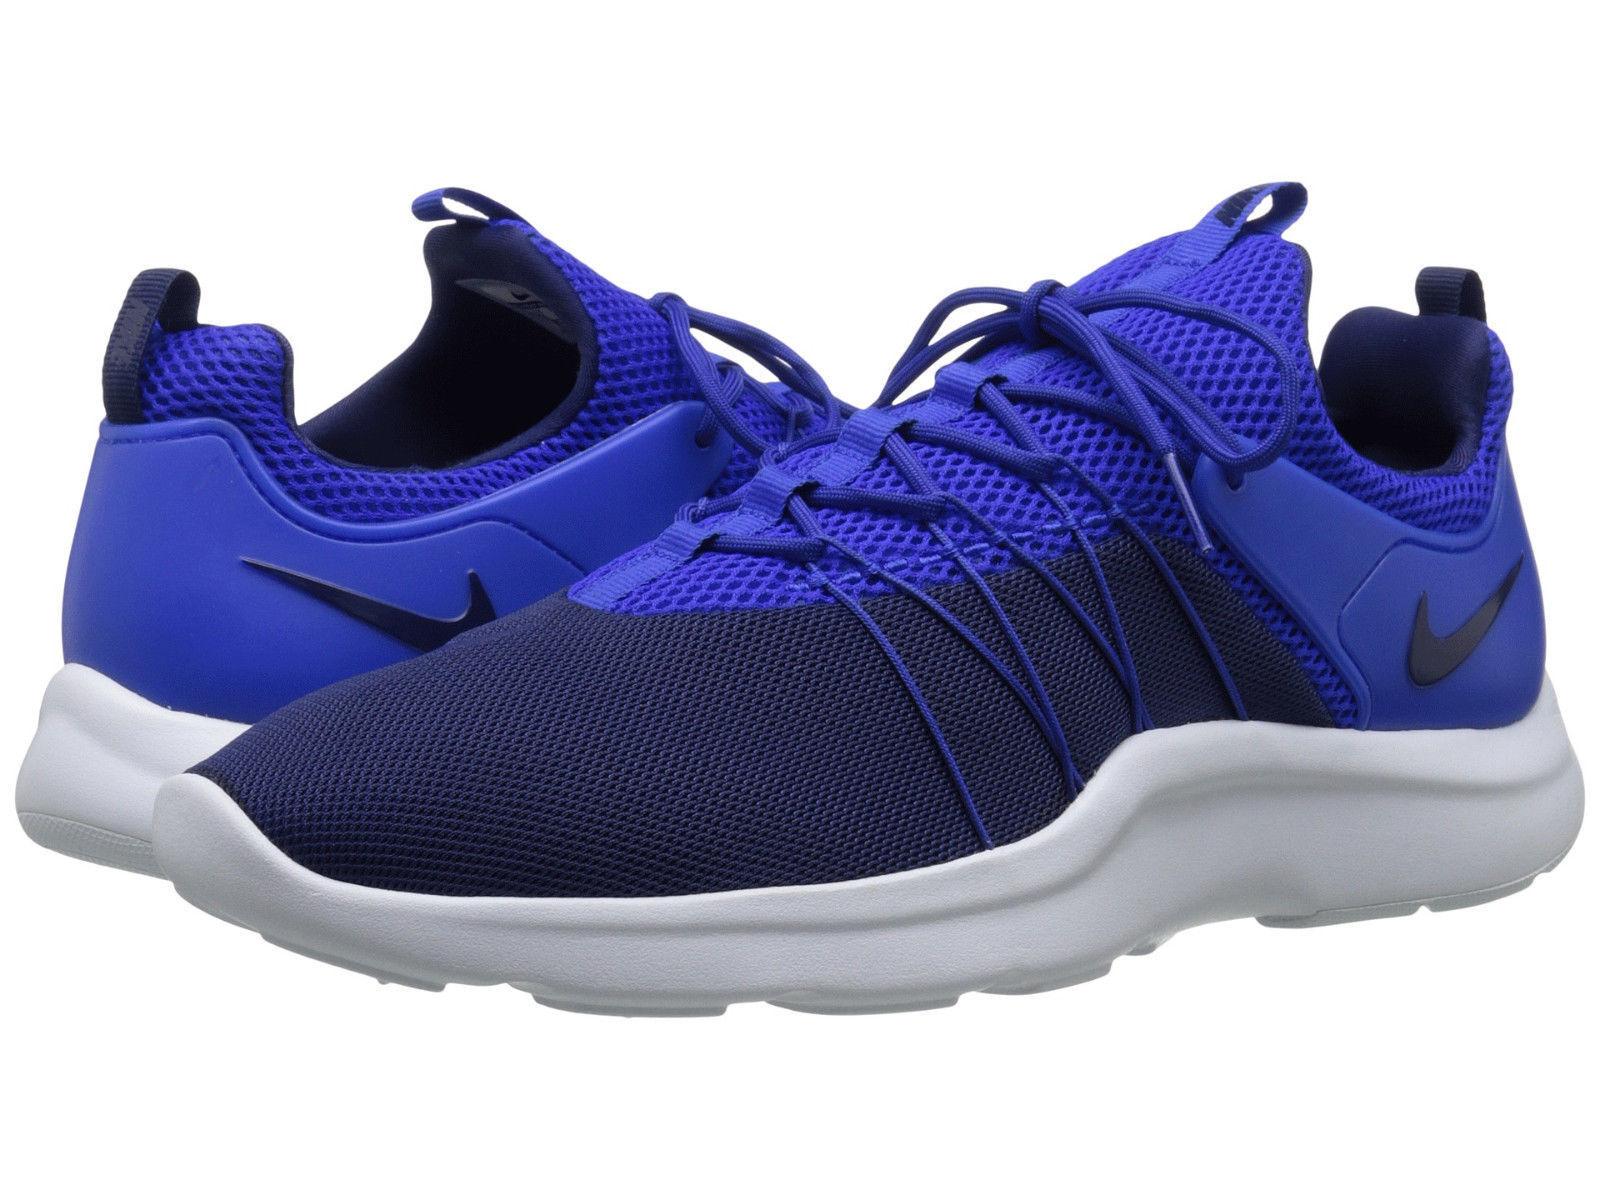 819803-444 Hommes Bleu/blanc Nike Darwin Royal Bleu/Racer Bleu/blanc Hommes d81269